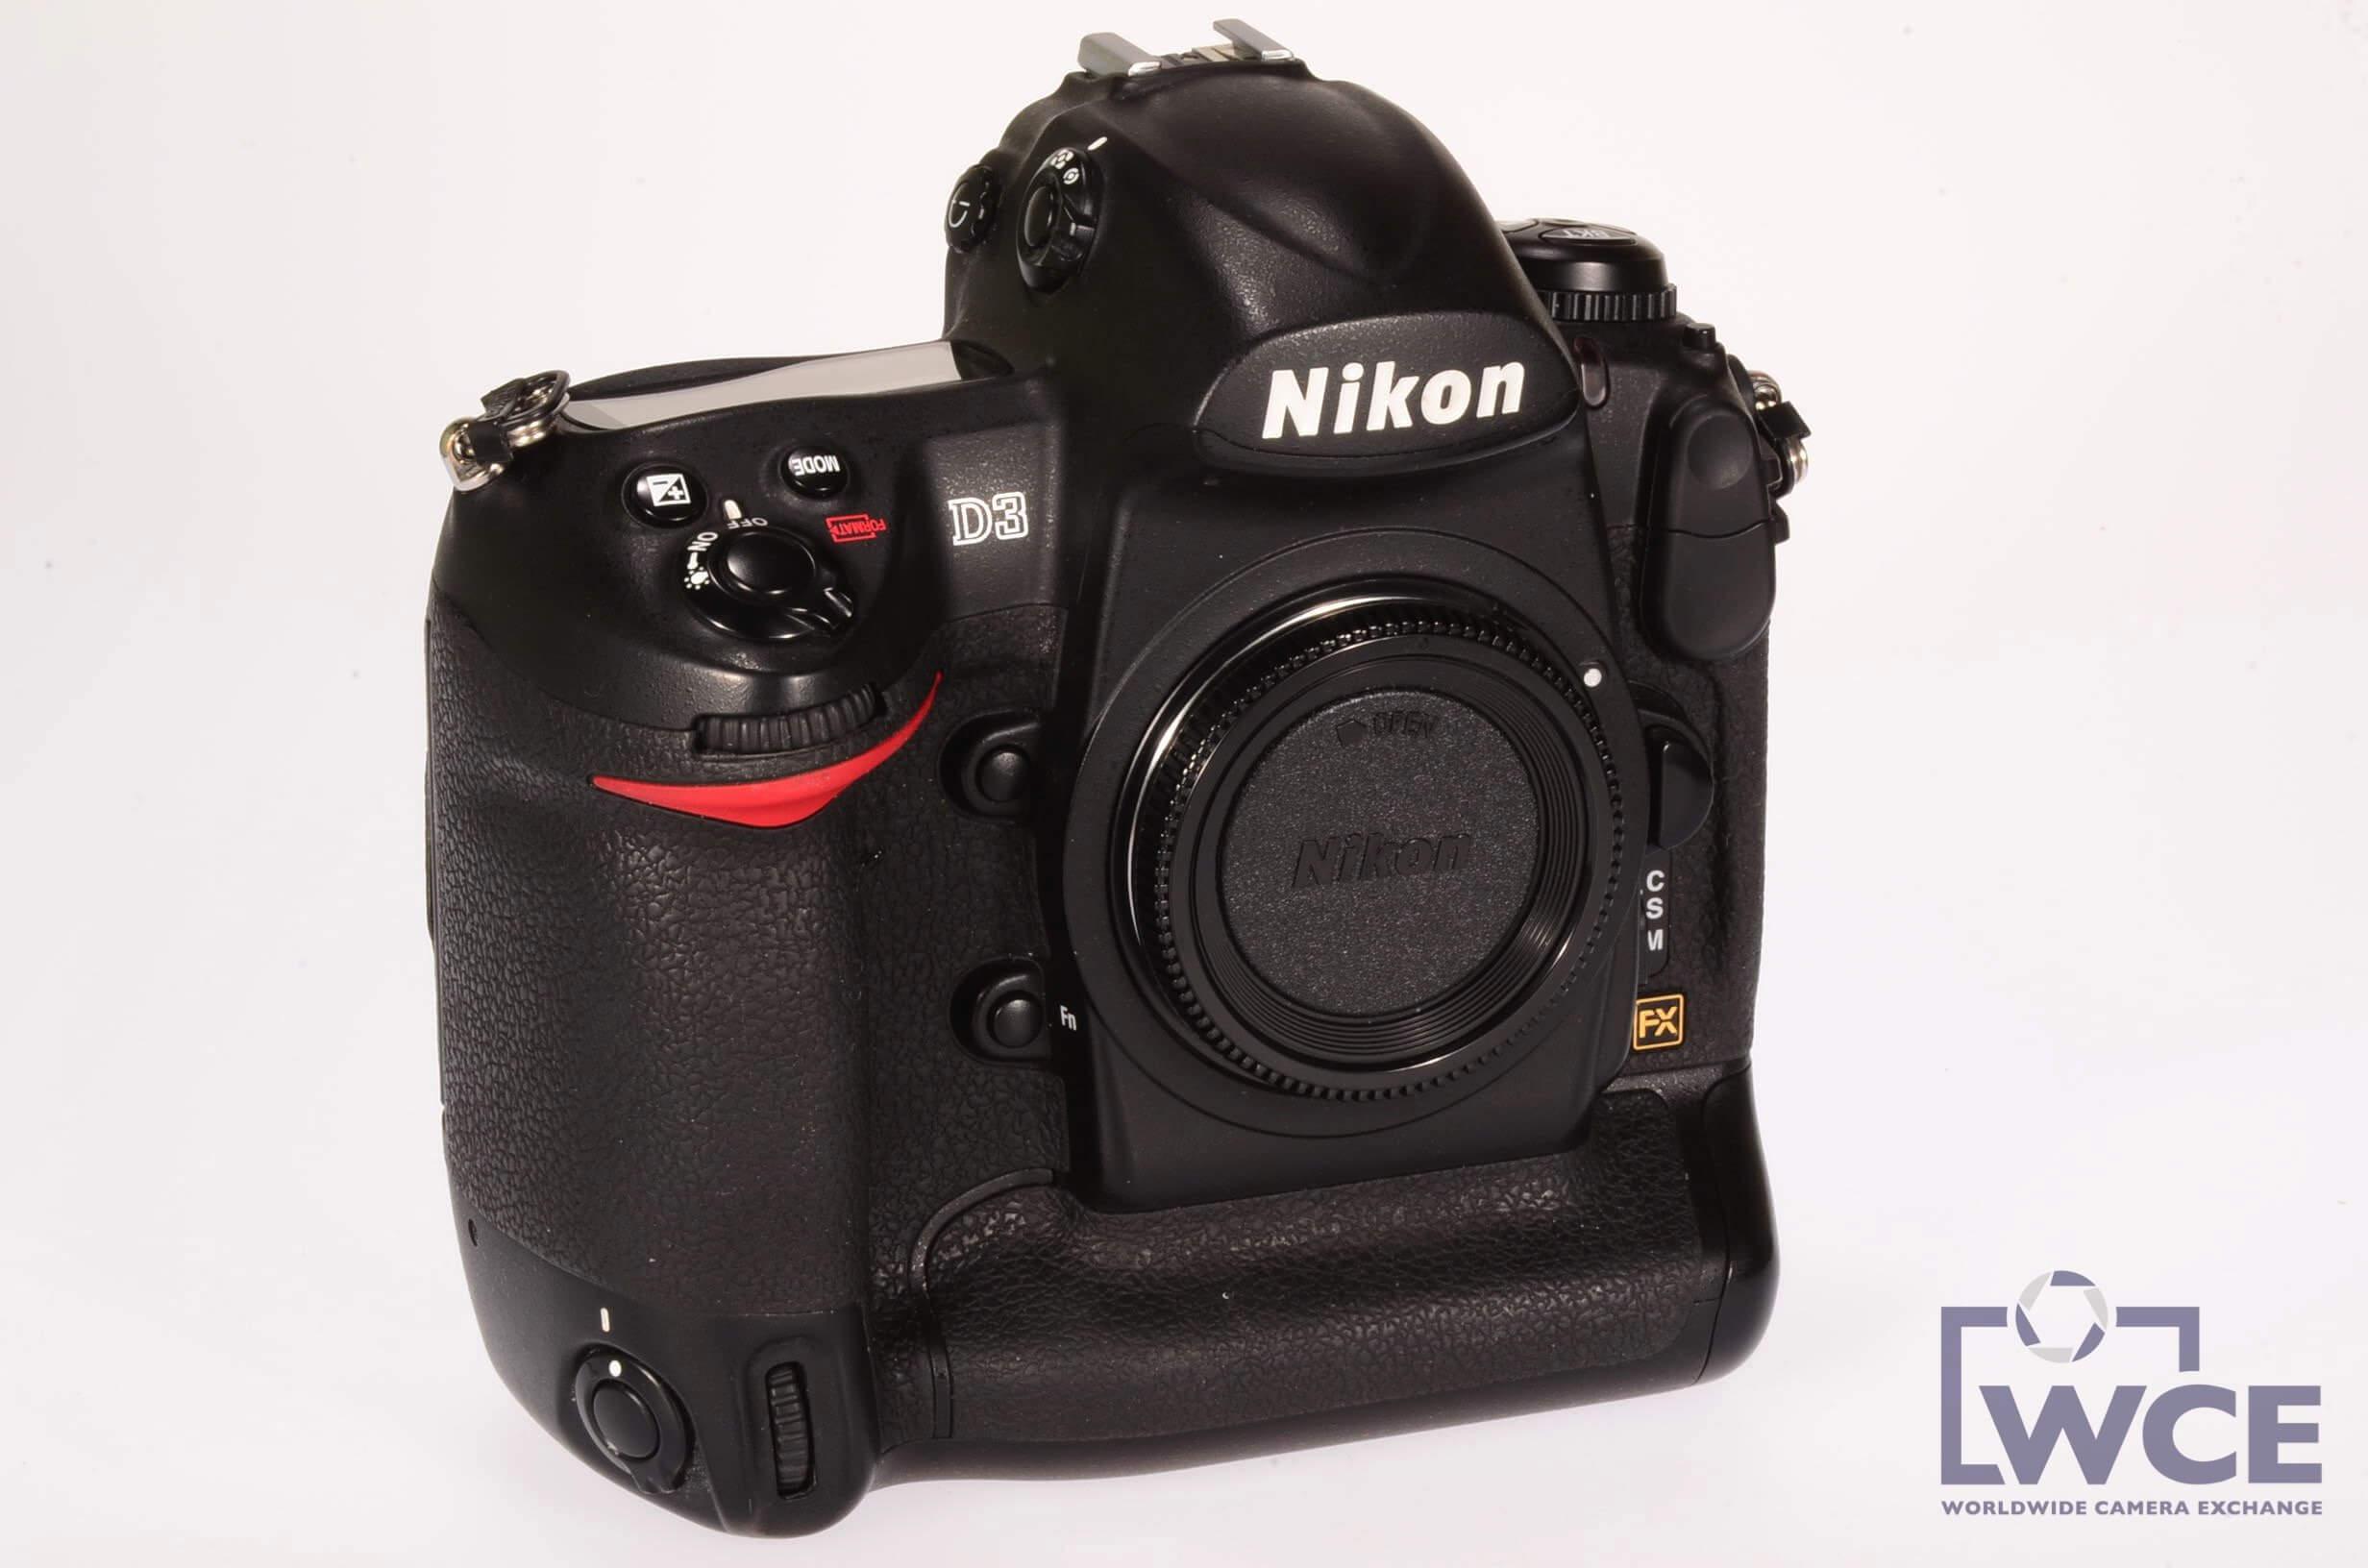 Nikon D3 body, excellent condition, low actuations